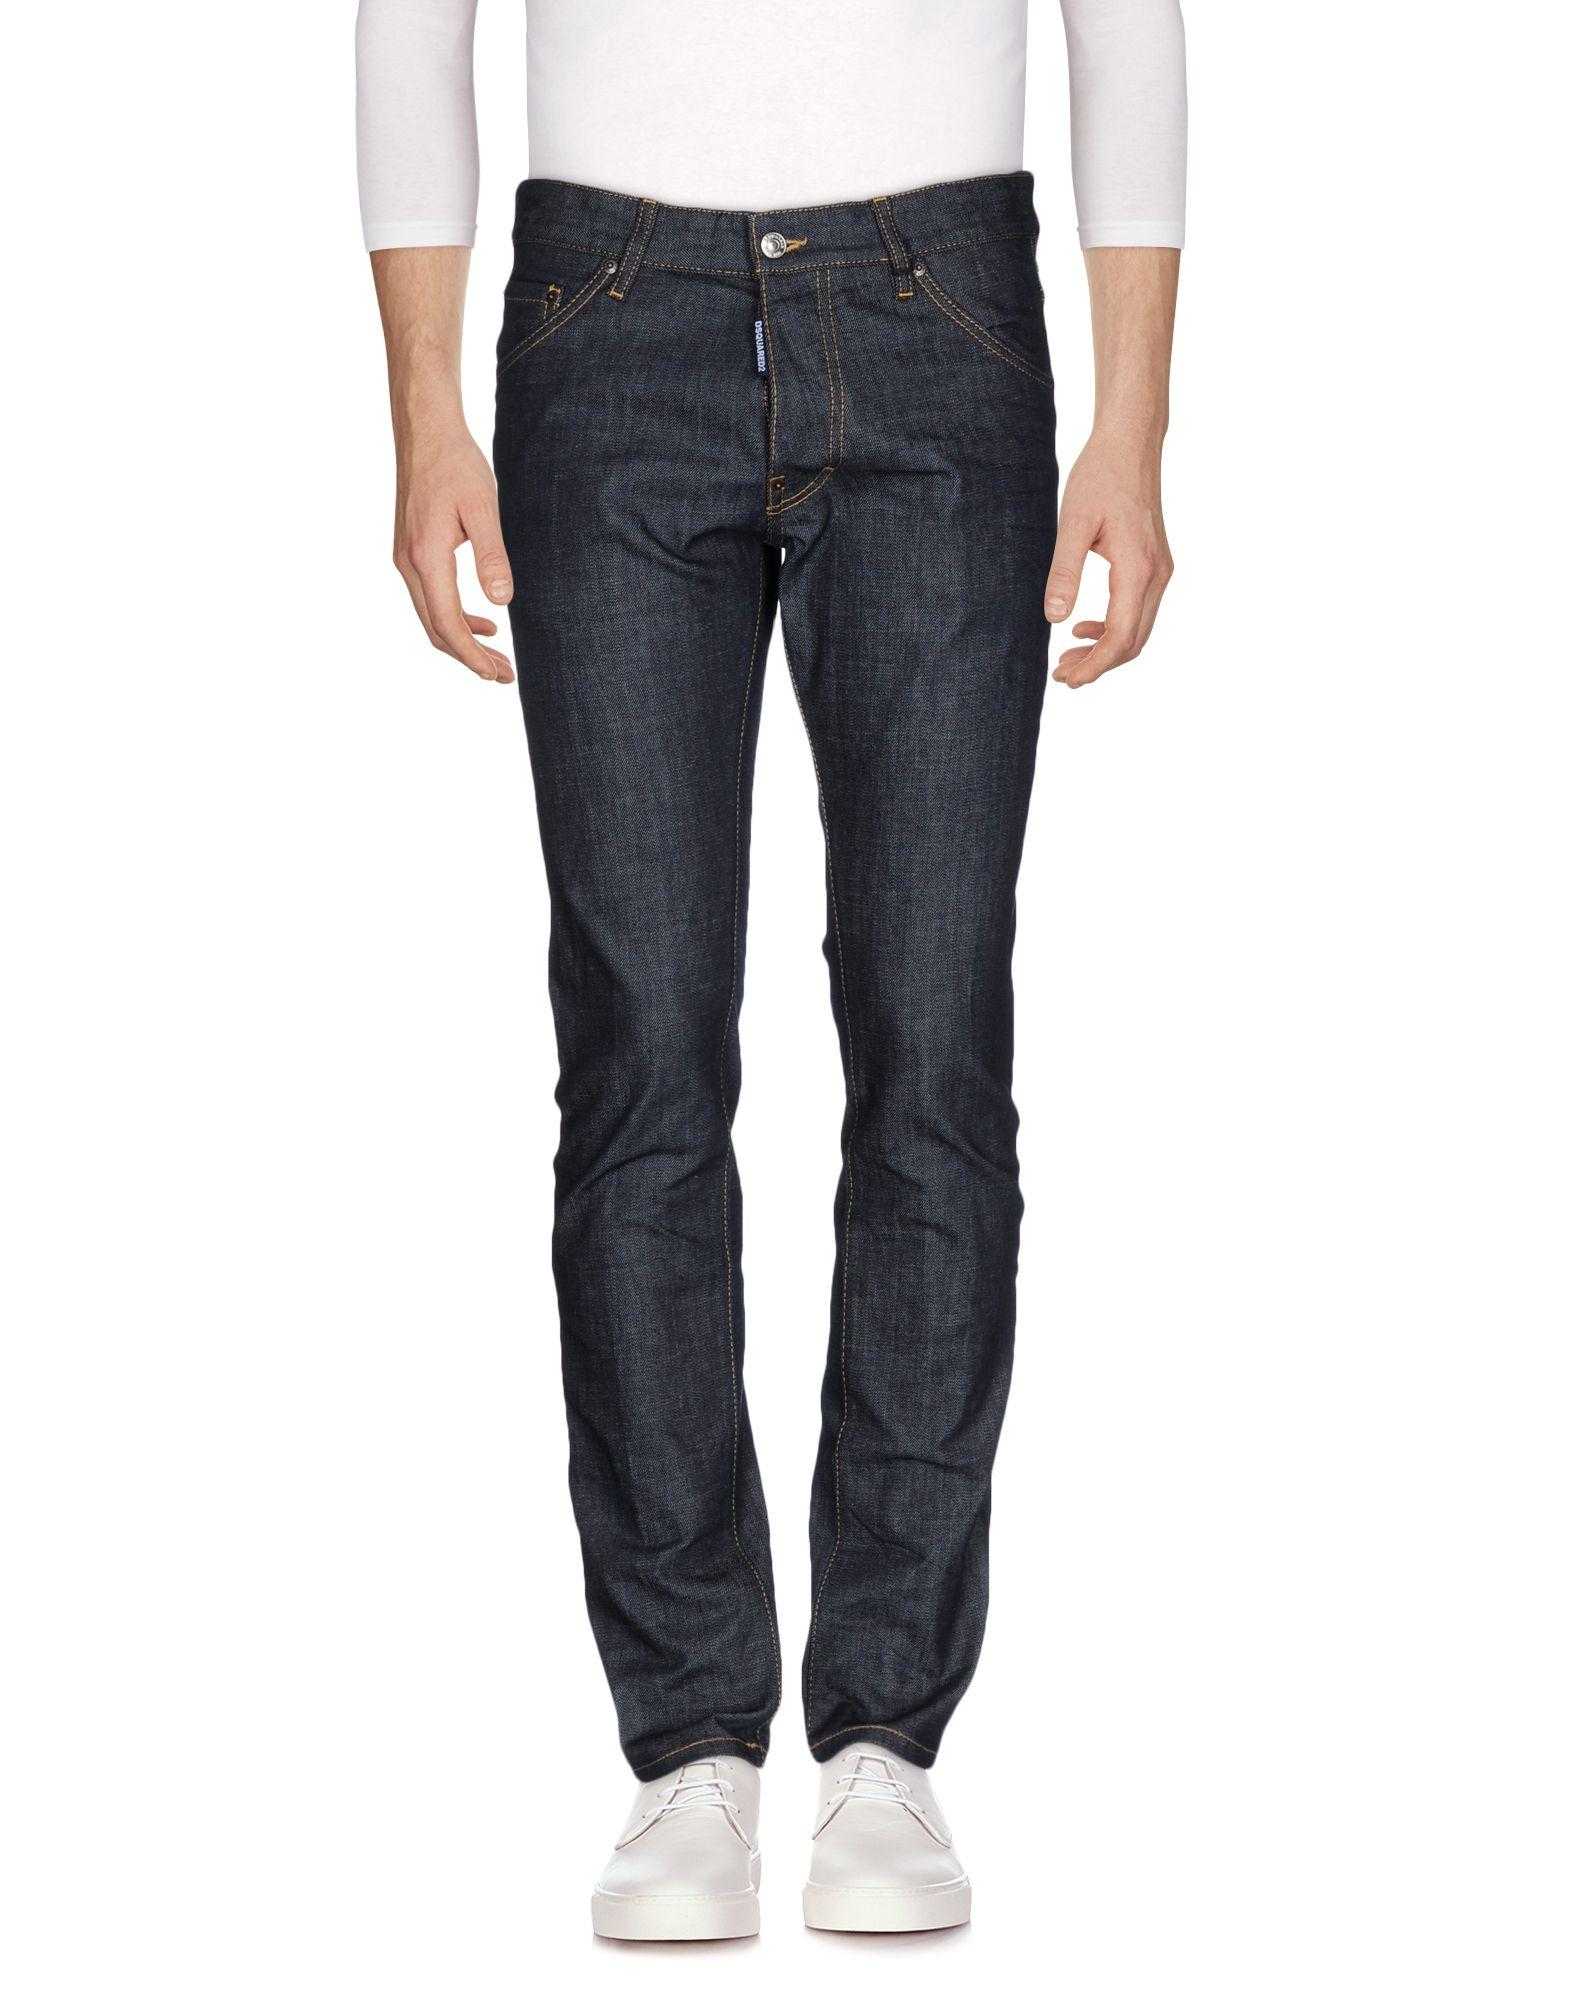 Pantaloni Jeans Dsquarosso2 Uomo - - - 42559617NN daa2a4